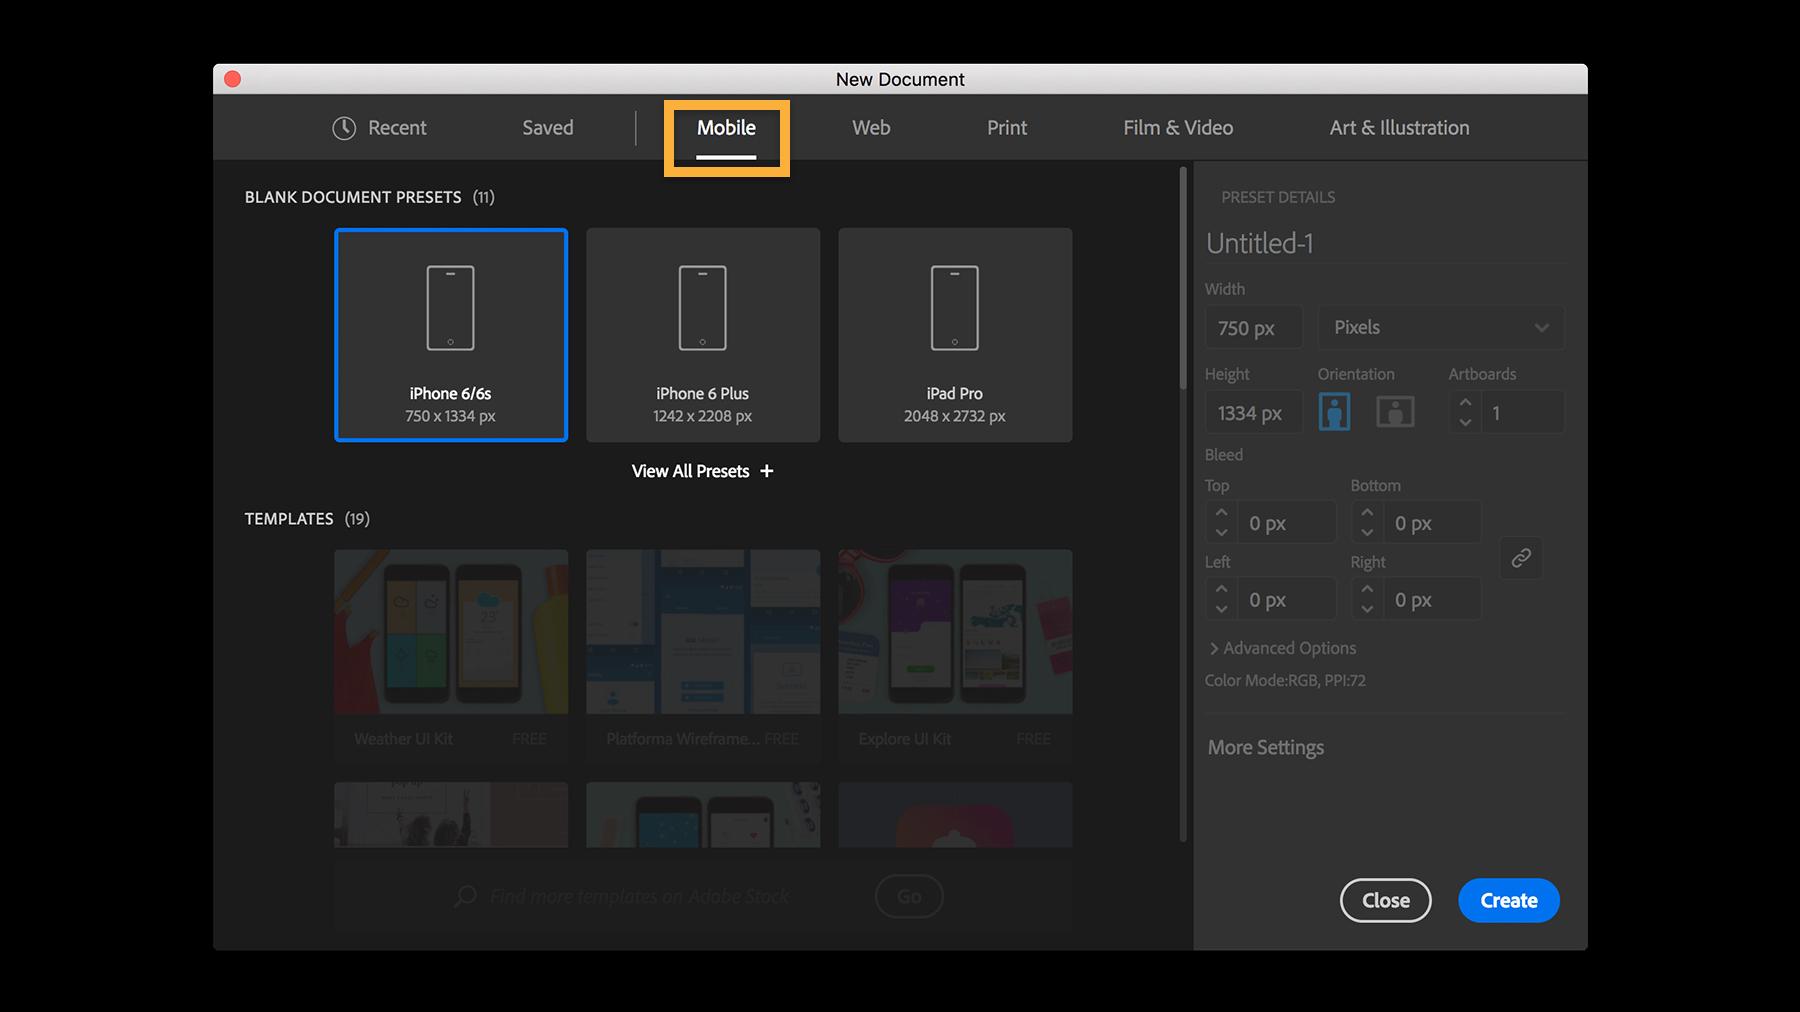 How to create a new document in Illustrator | Adobe Illustrator ... jpg black and white